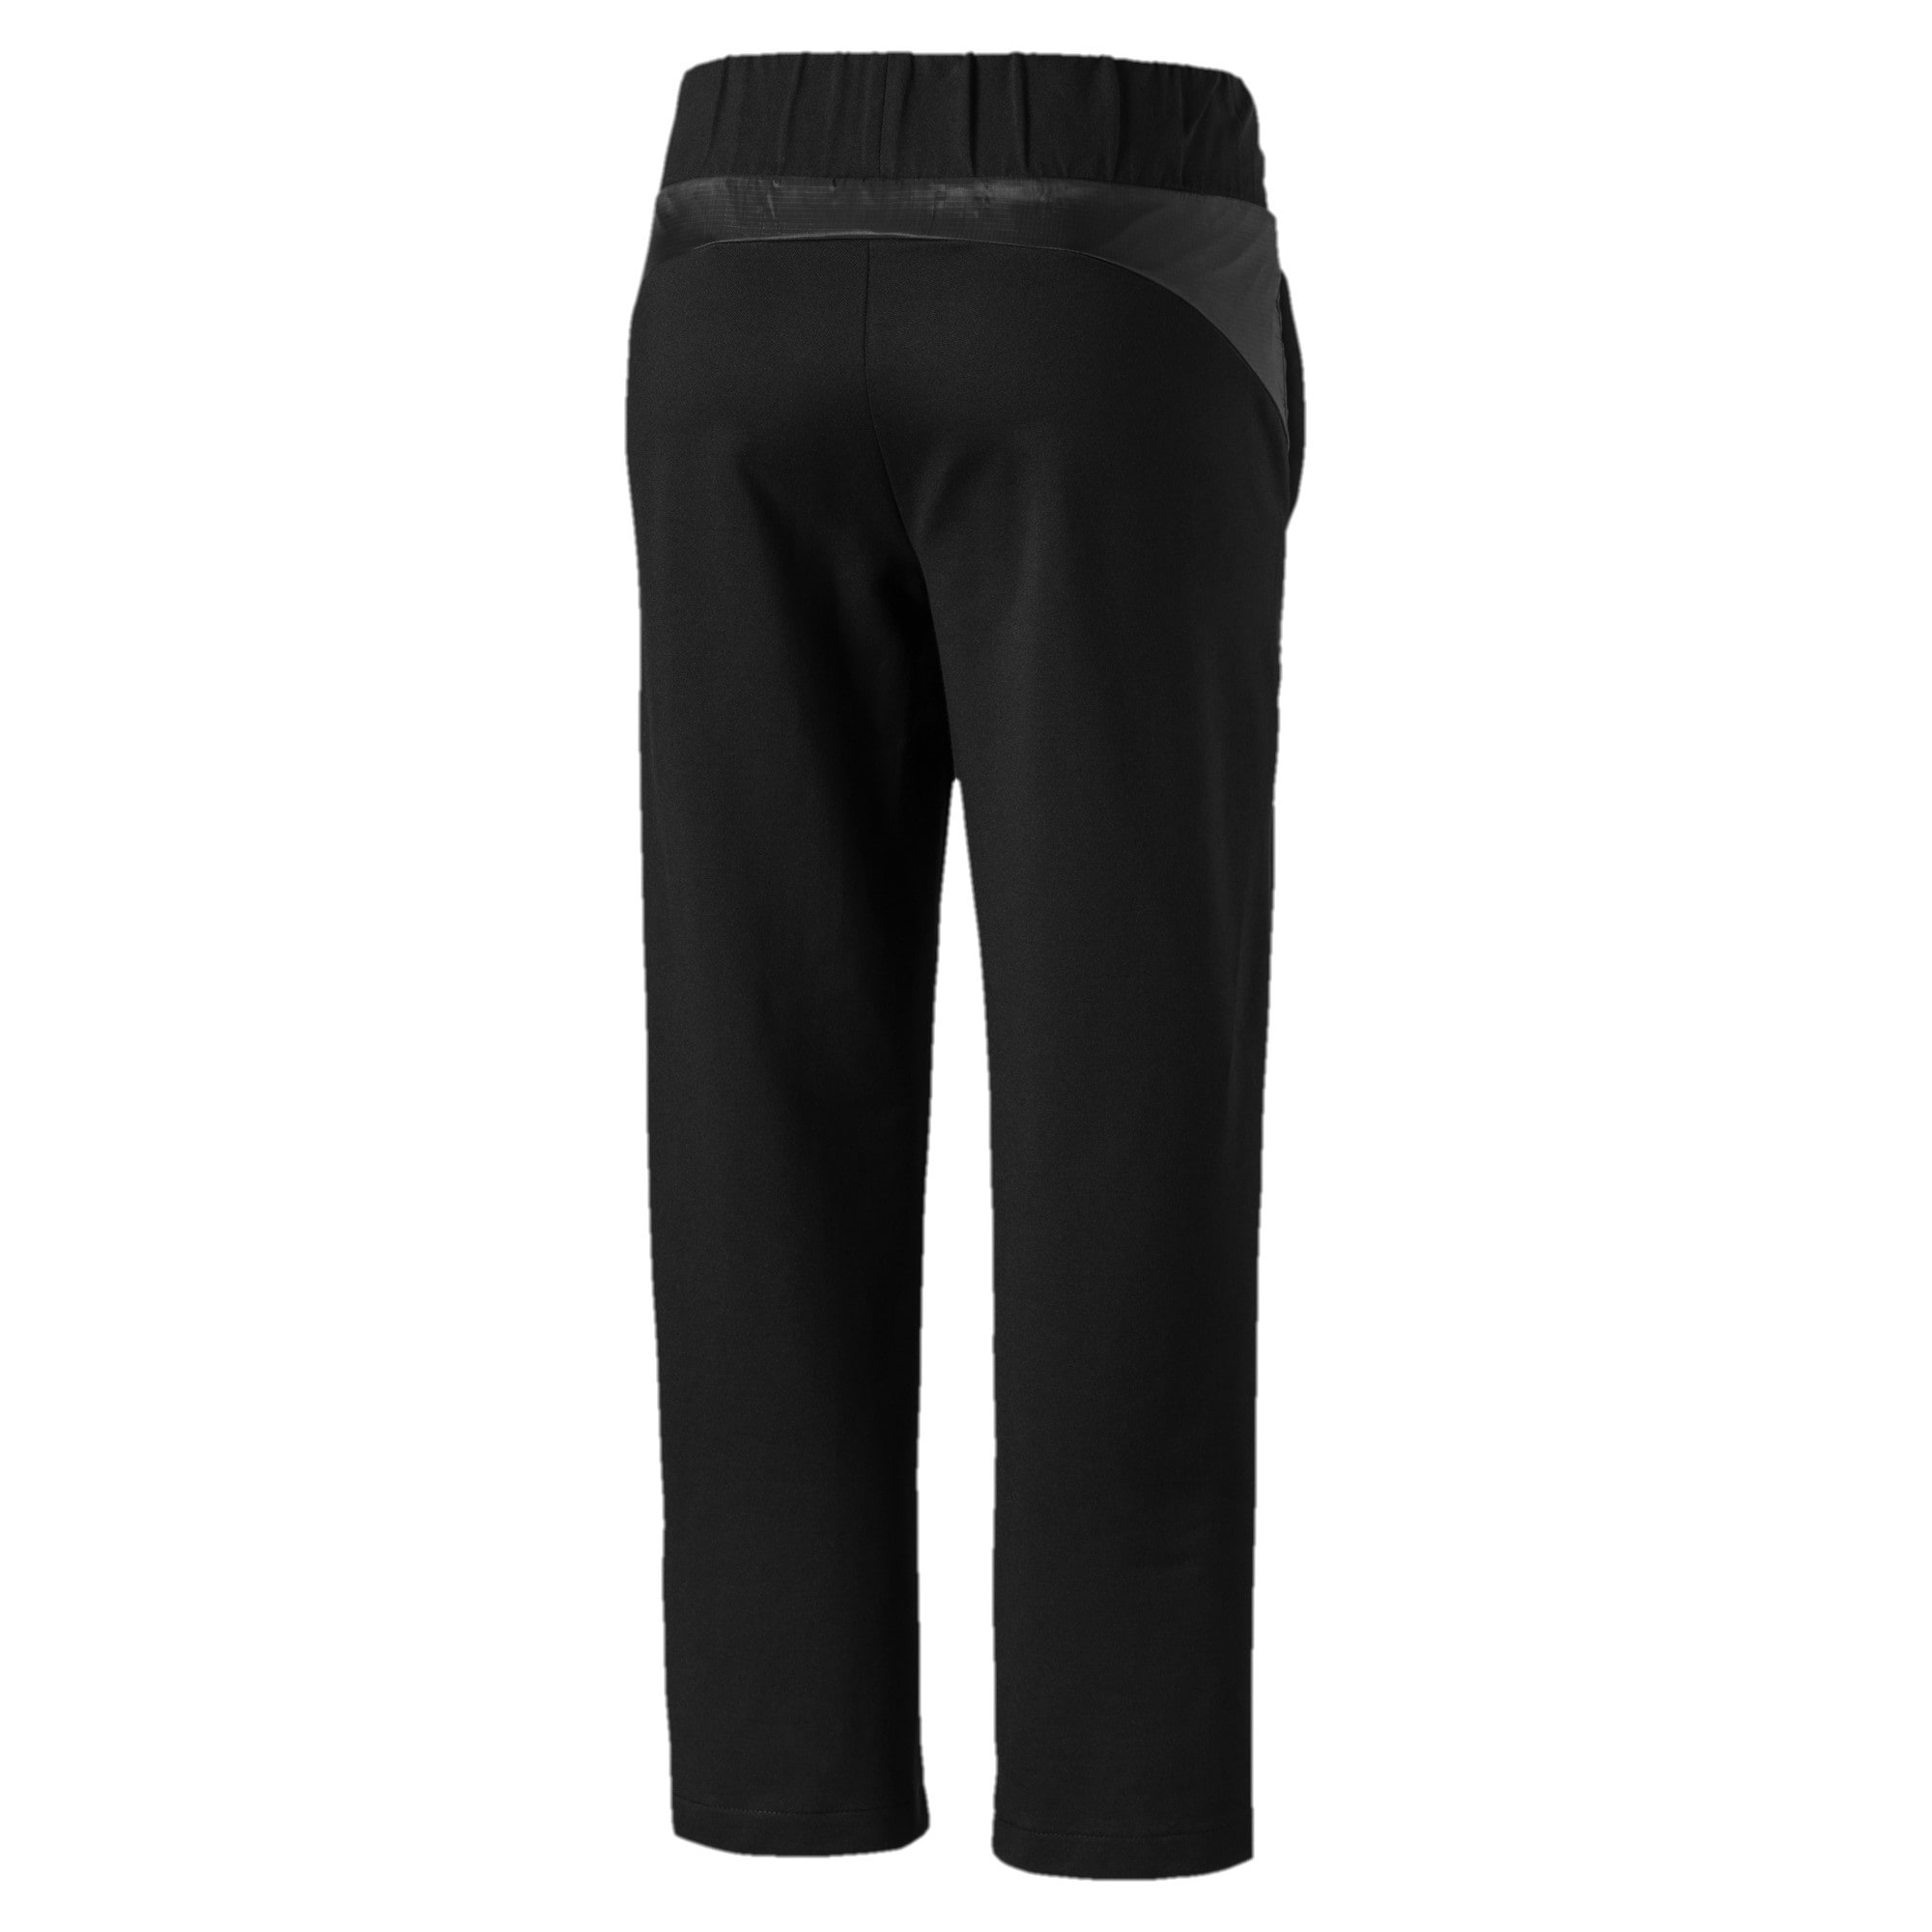 Thumbnail 5 of Scuderia Ferrari Women's Sweatpants, Puma Black, medium